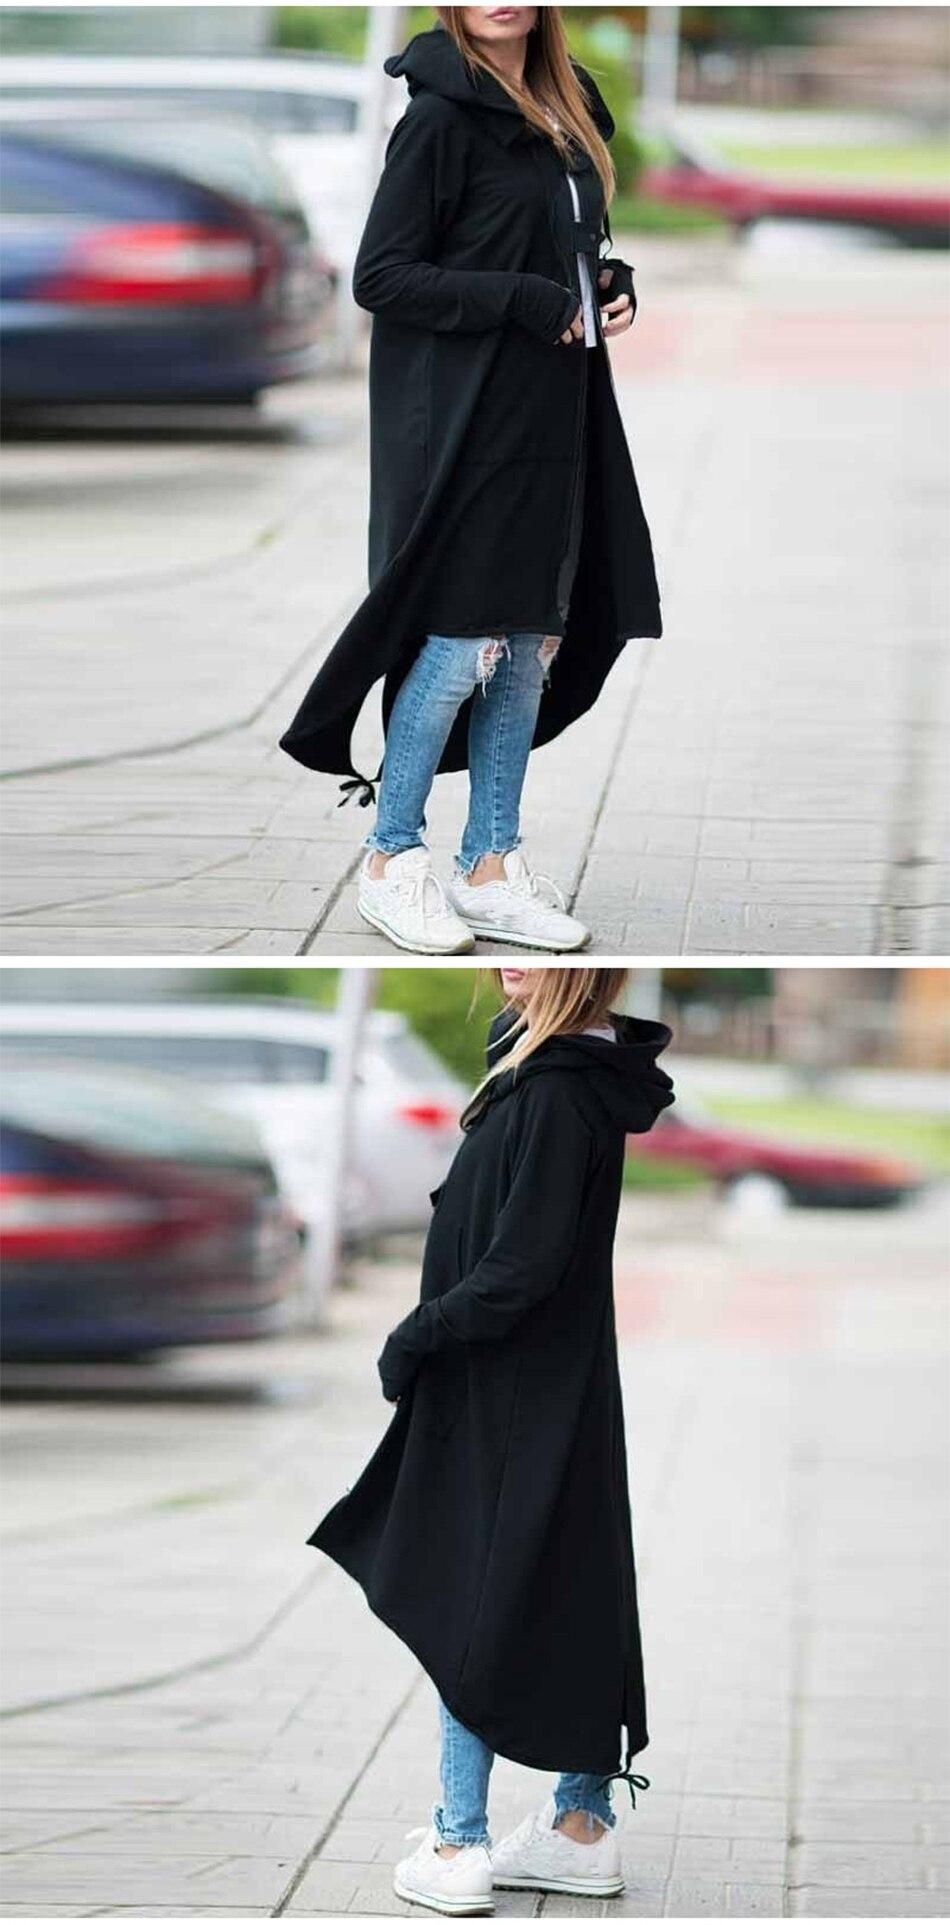 CROPKOP Fashion Long Sleeve Hooded Trench Coat 18 Autumn Black Zipper Plus Size 5XL Velvet Long Coat Women Overcoat Clothes 5